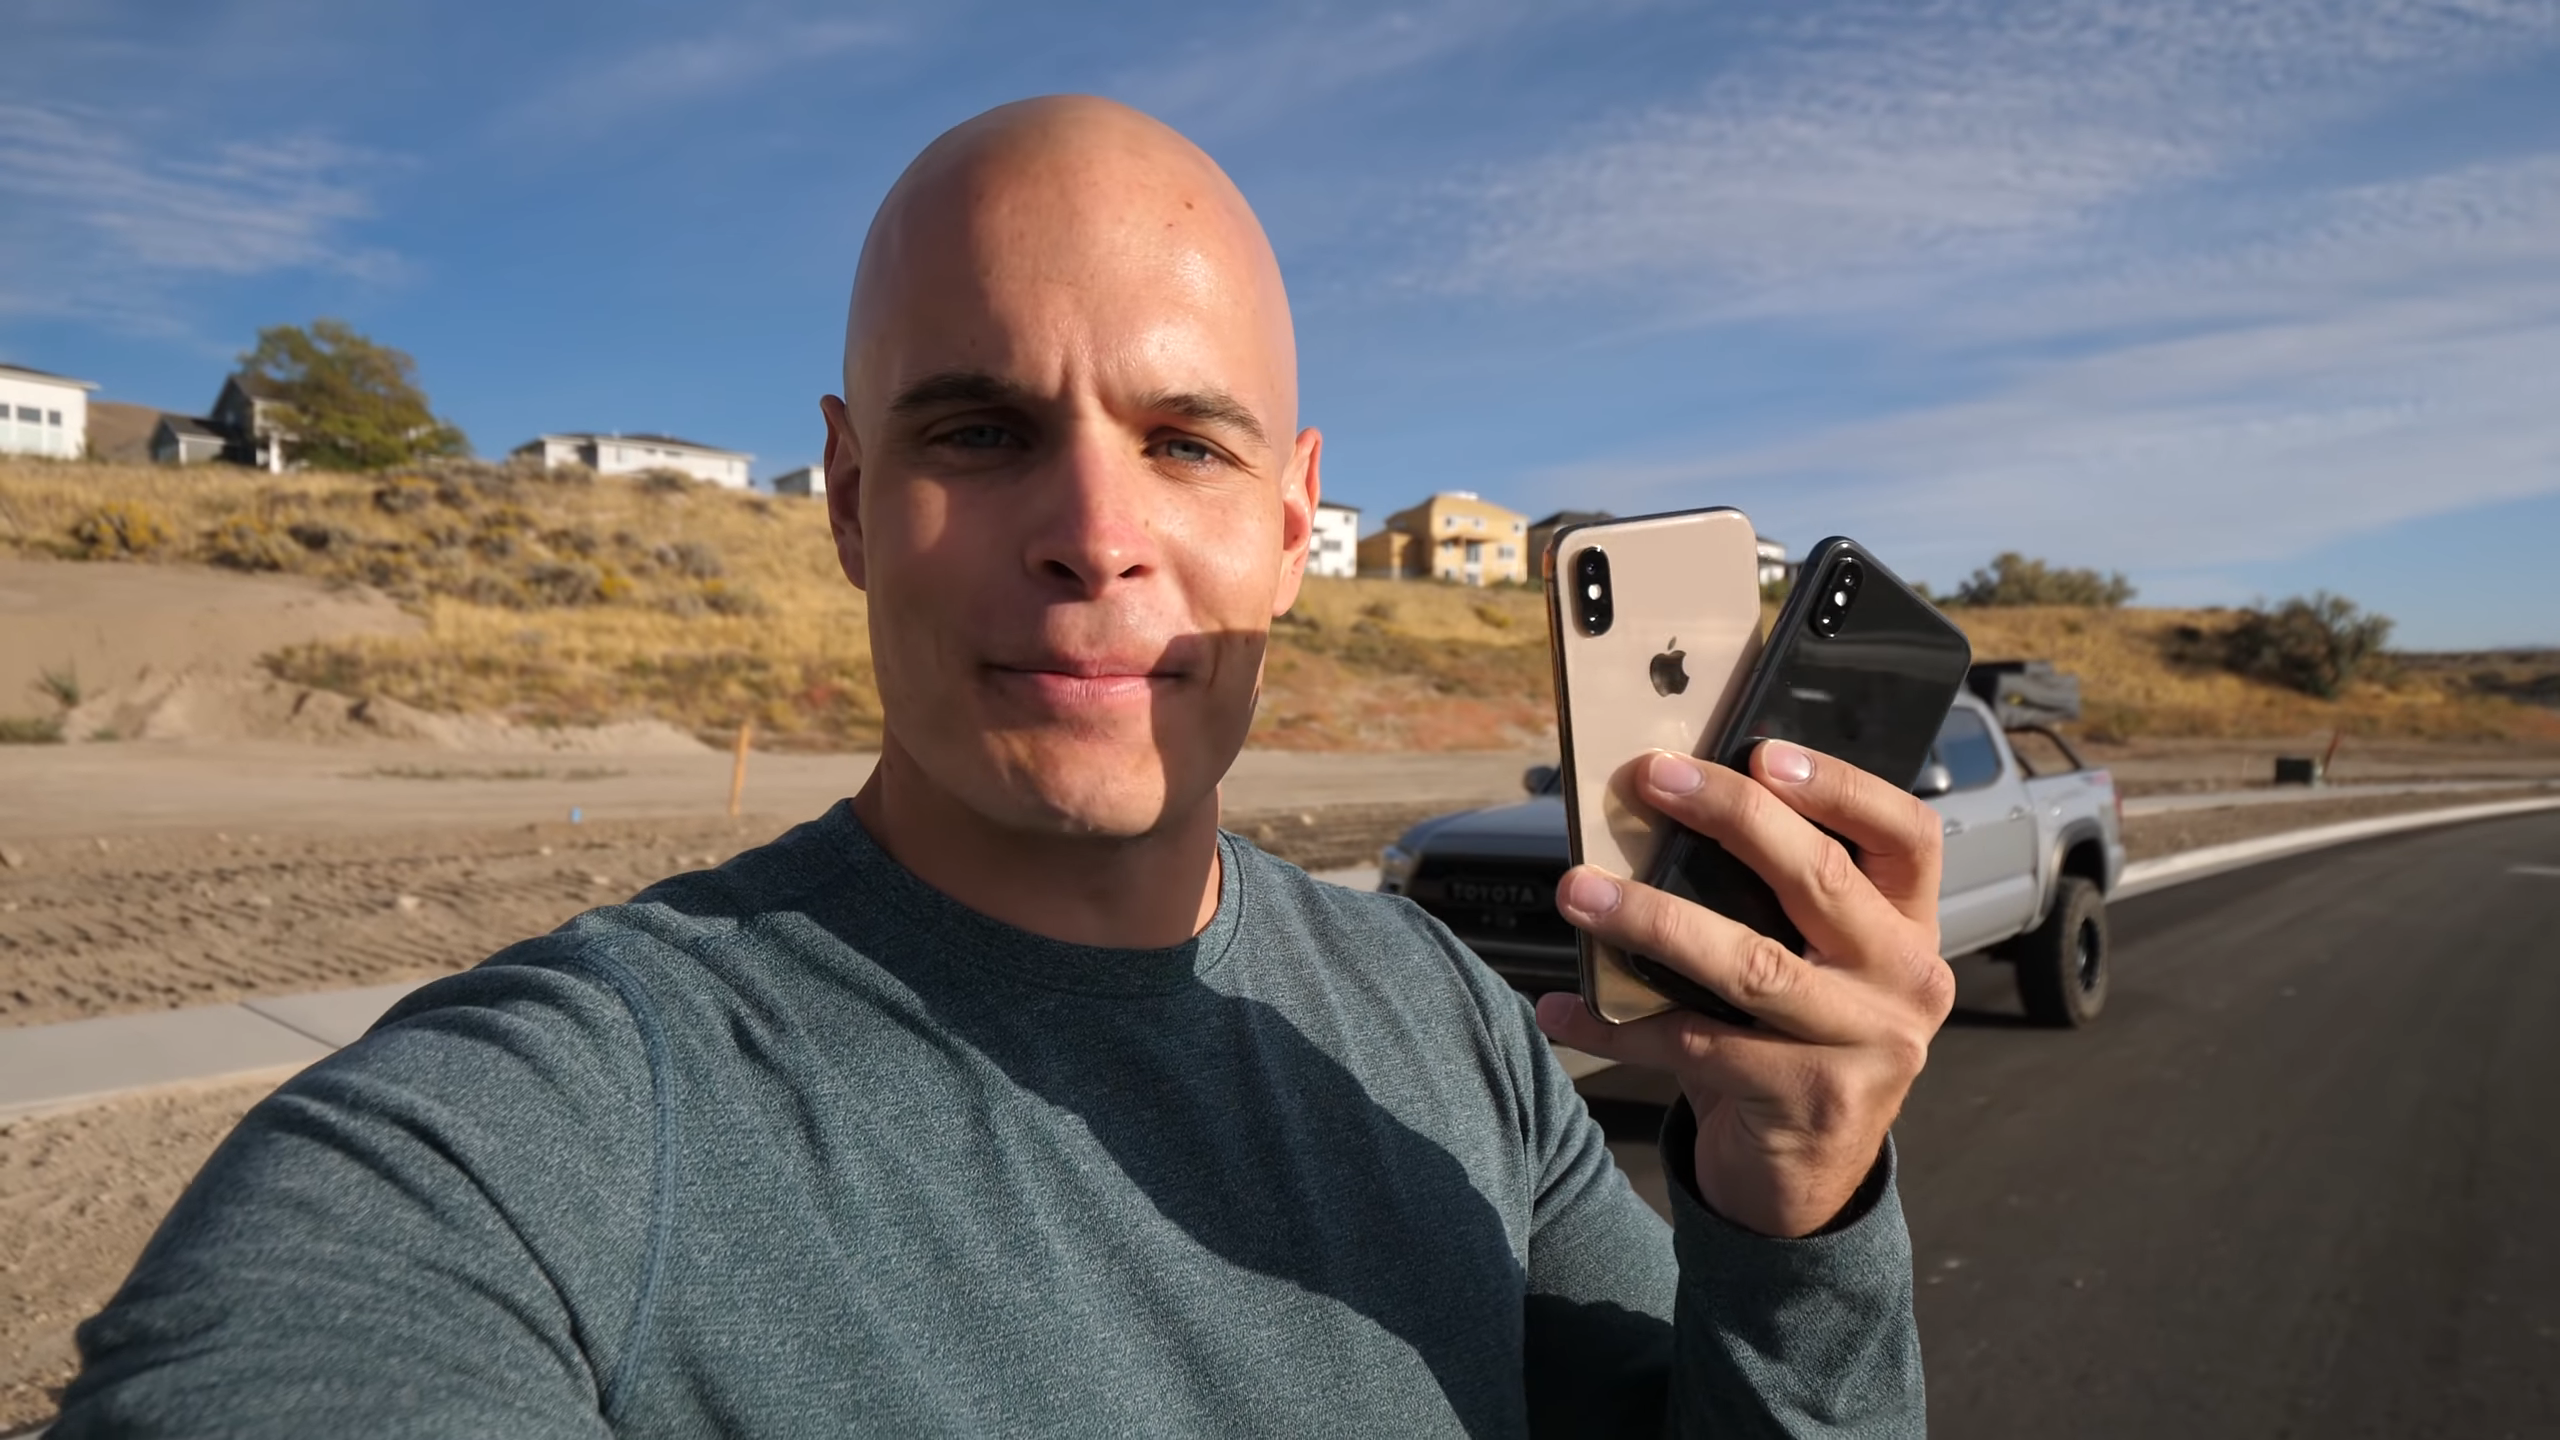 iPhone Xs drop test JerryRigEverything - Naslovna